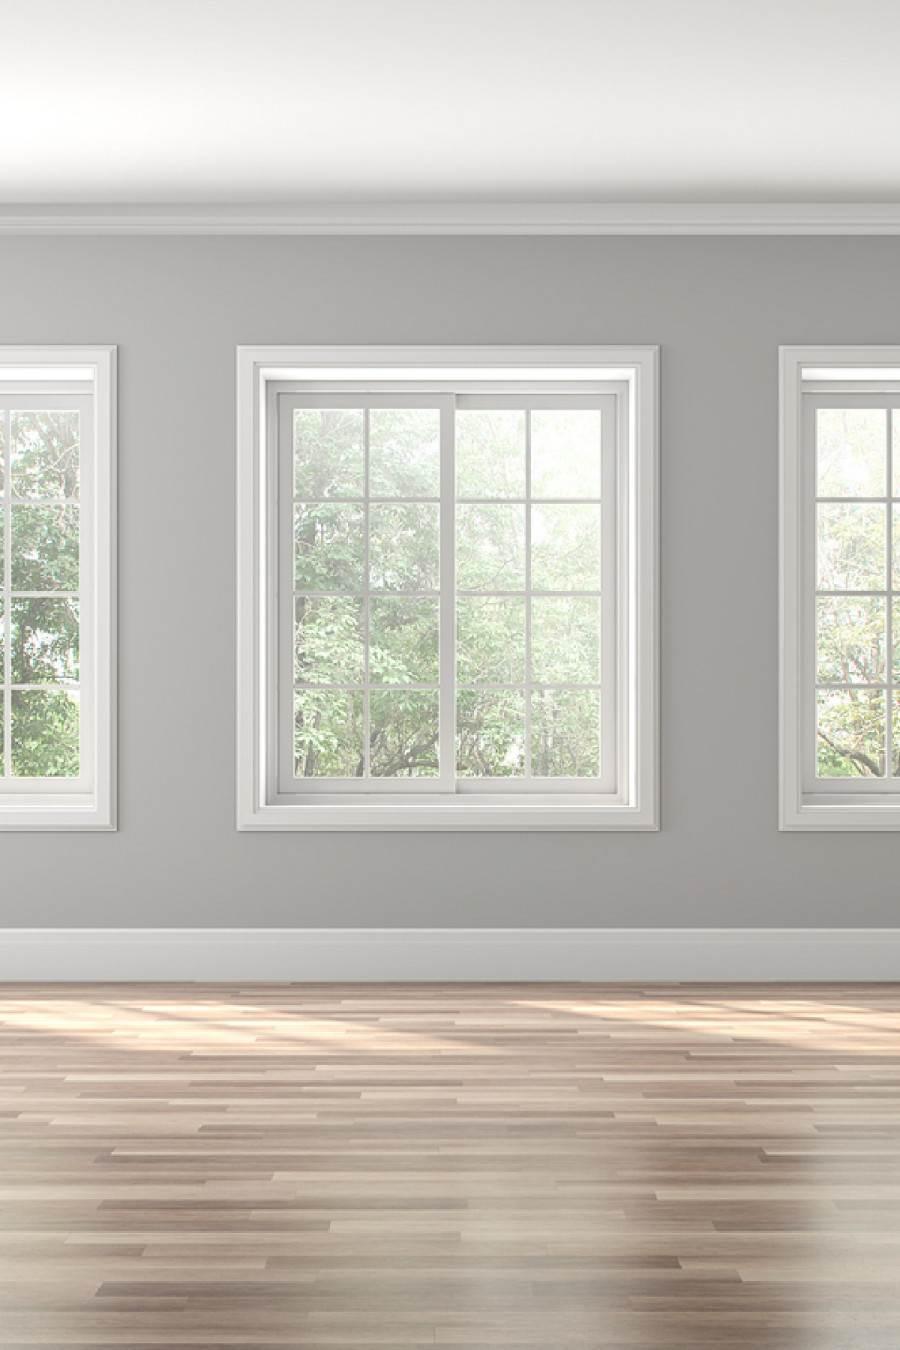 GRAY WALLS AND WHITE WINDOWS